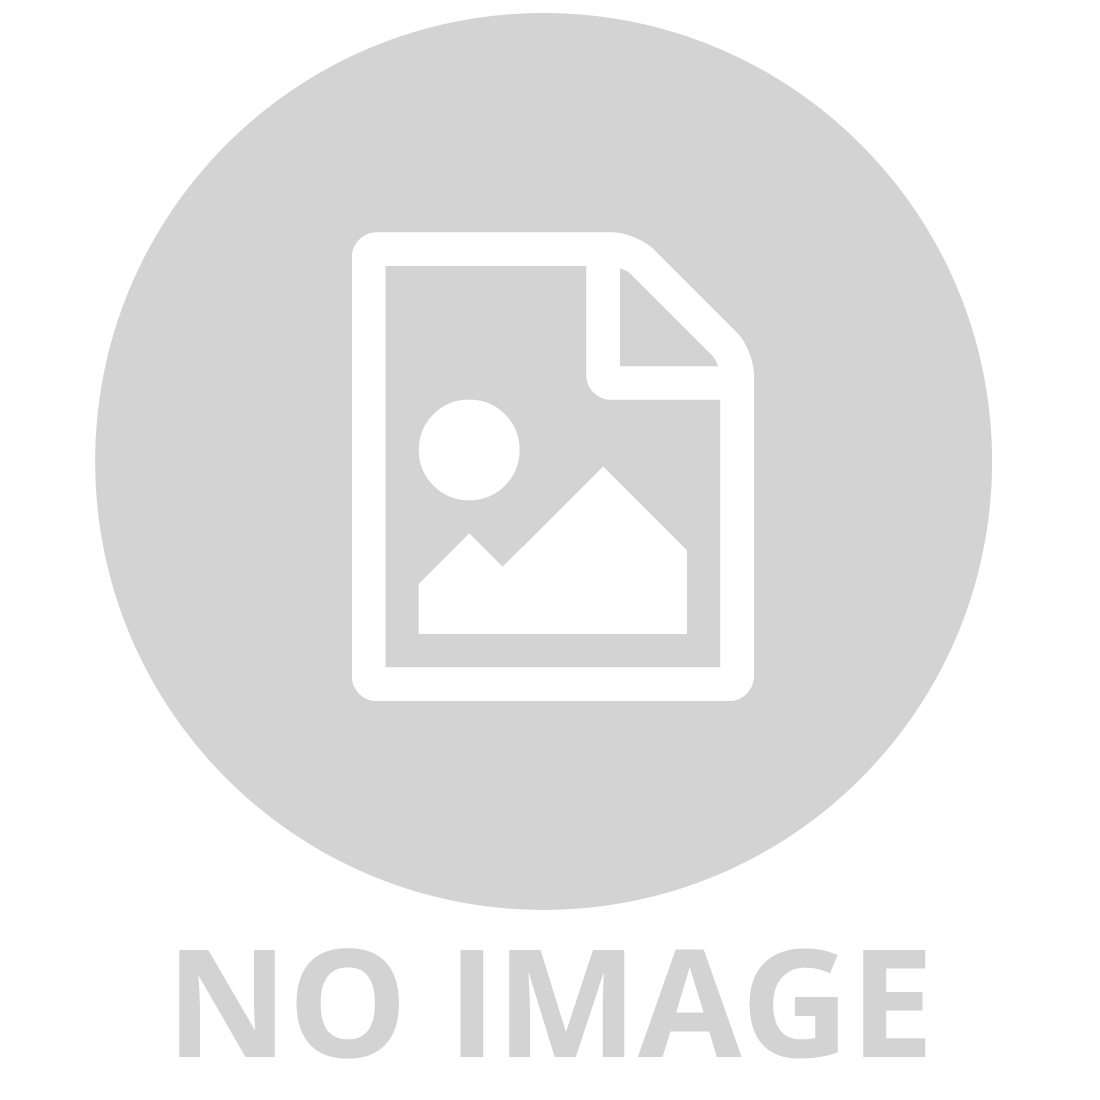 LEGO MARVEL 76129 SPIDER-MAN HYDRO-MAN ATTACK